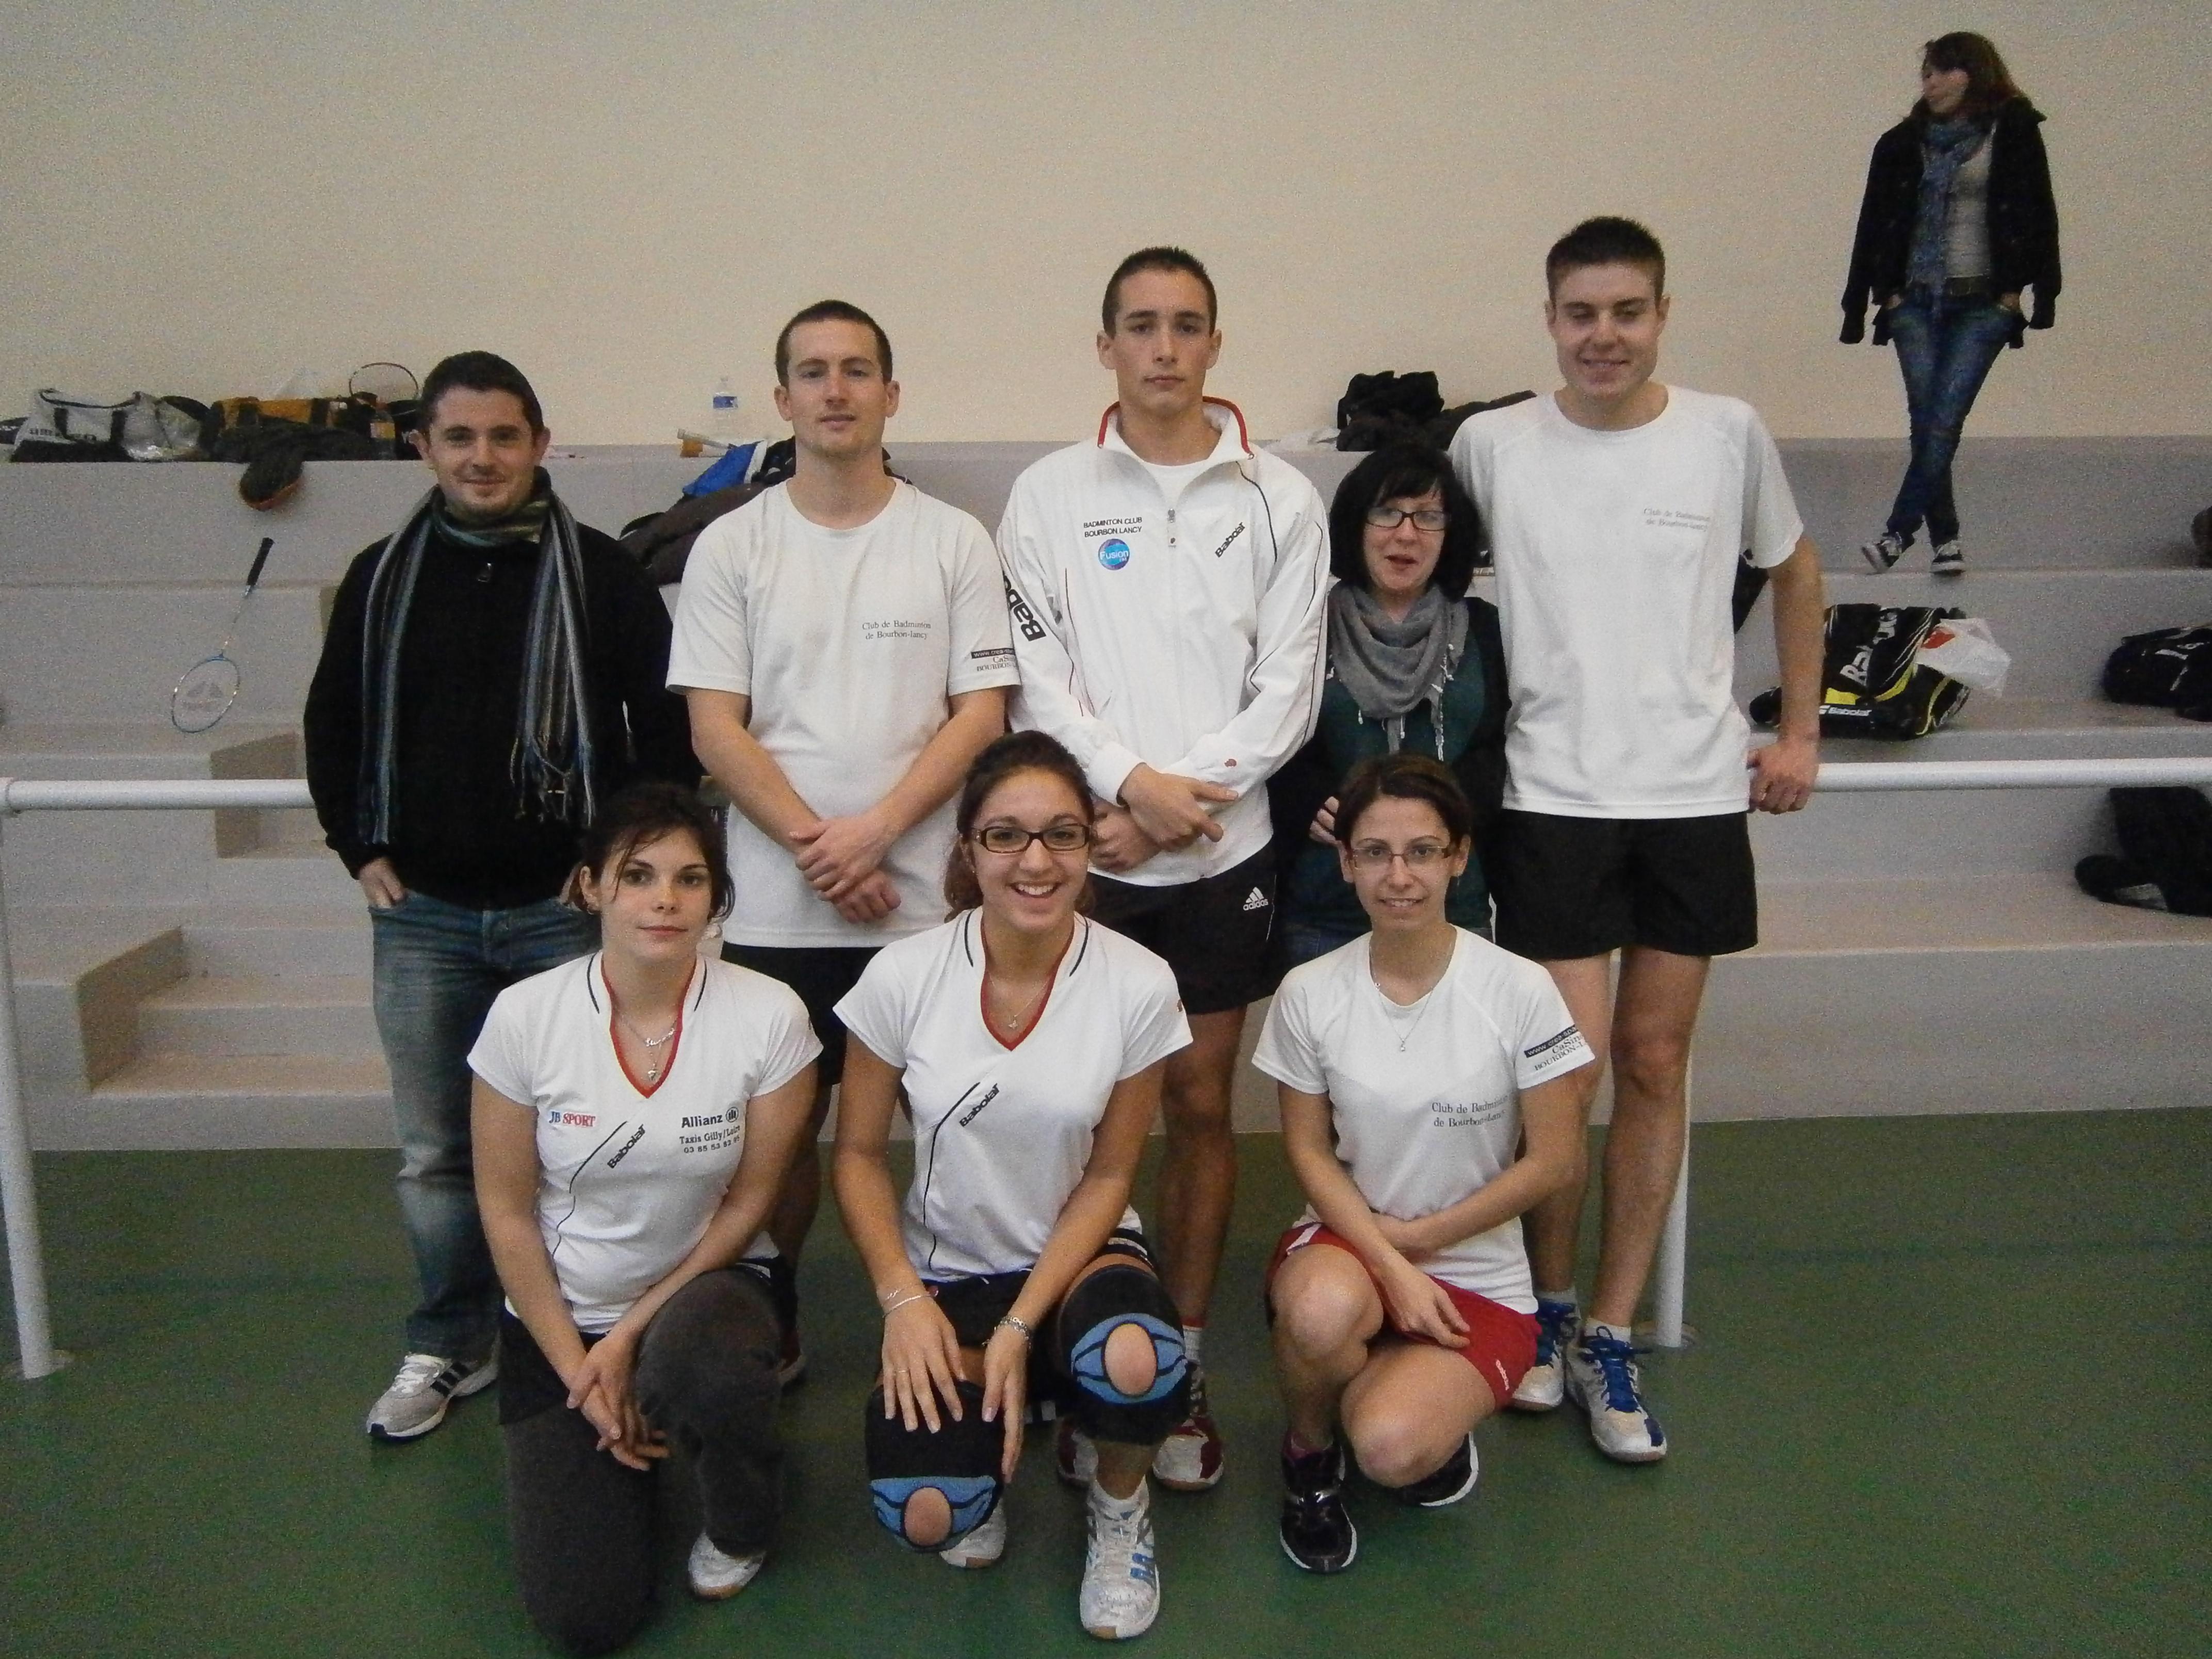 Bourbon-Lancy - Equipe 1 - 2014